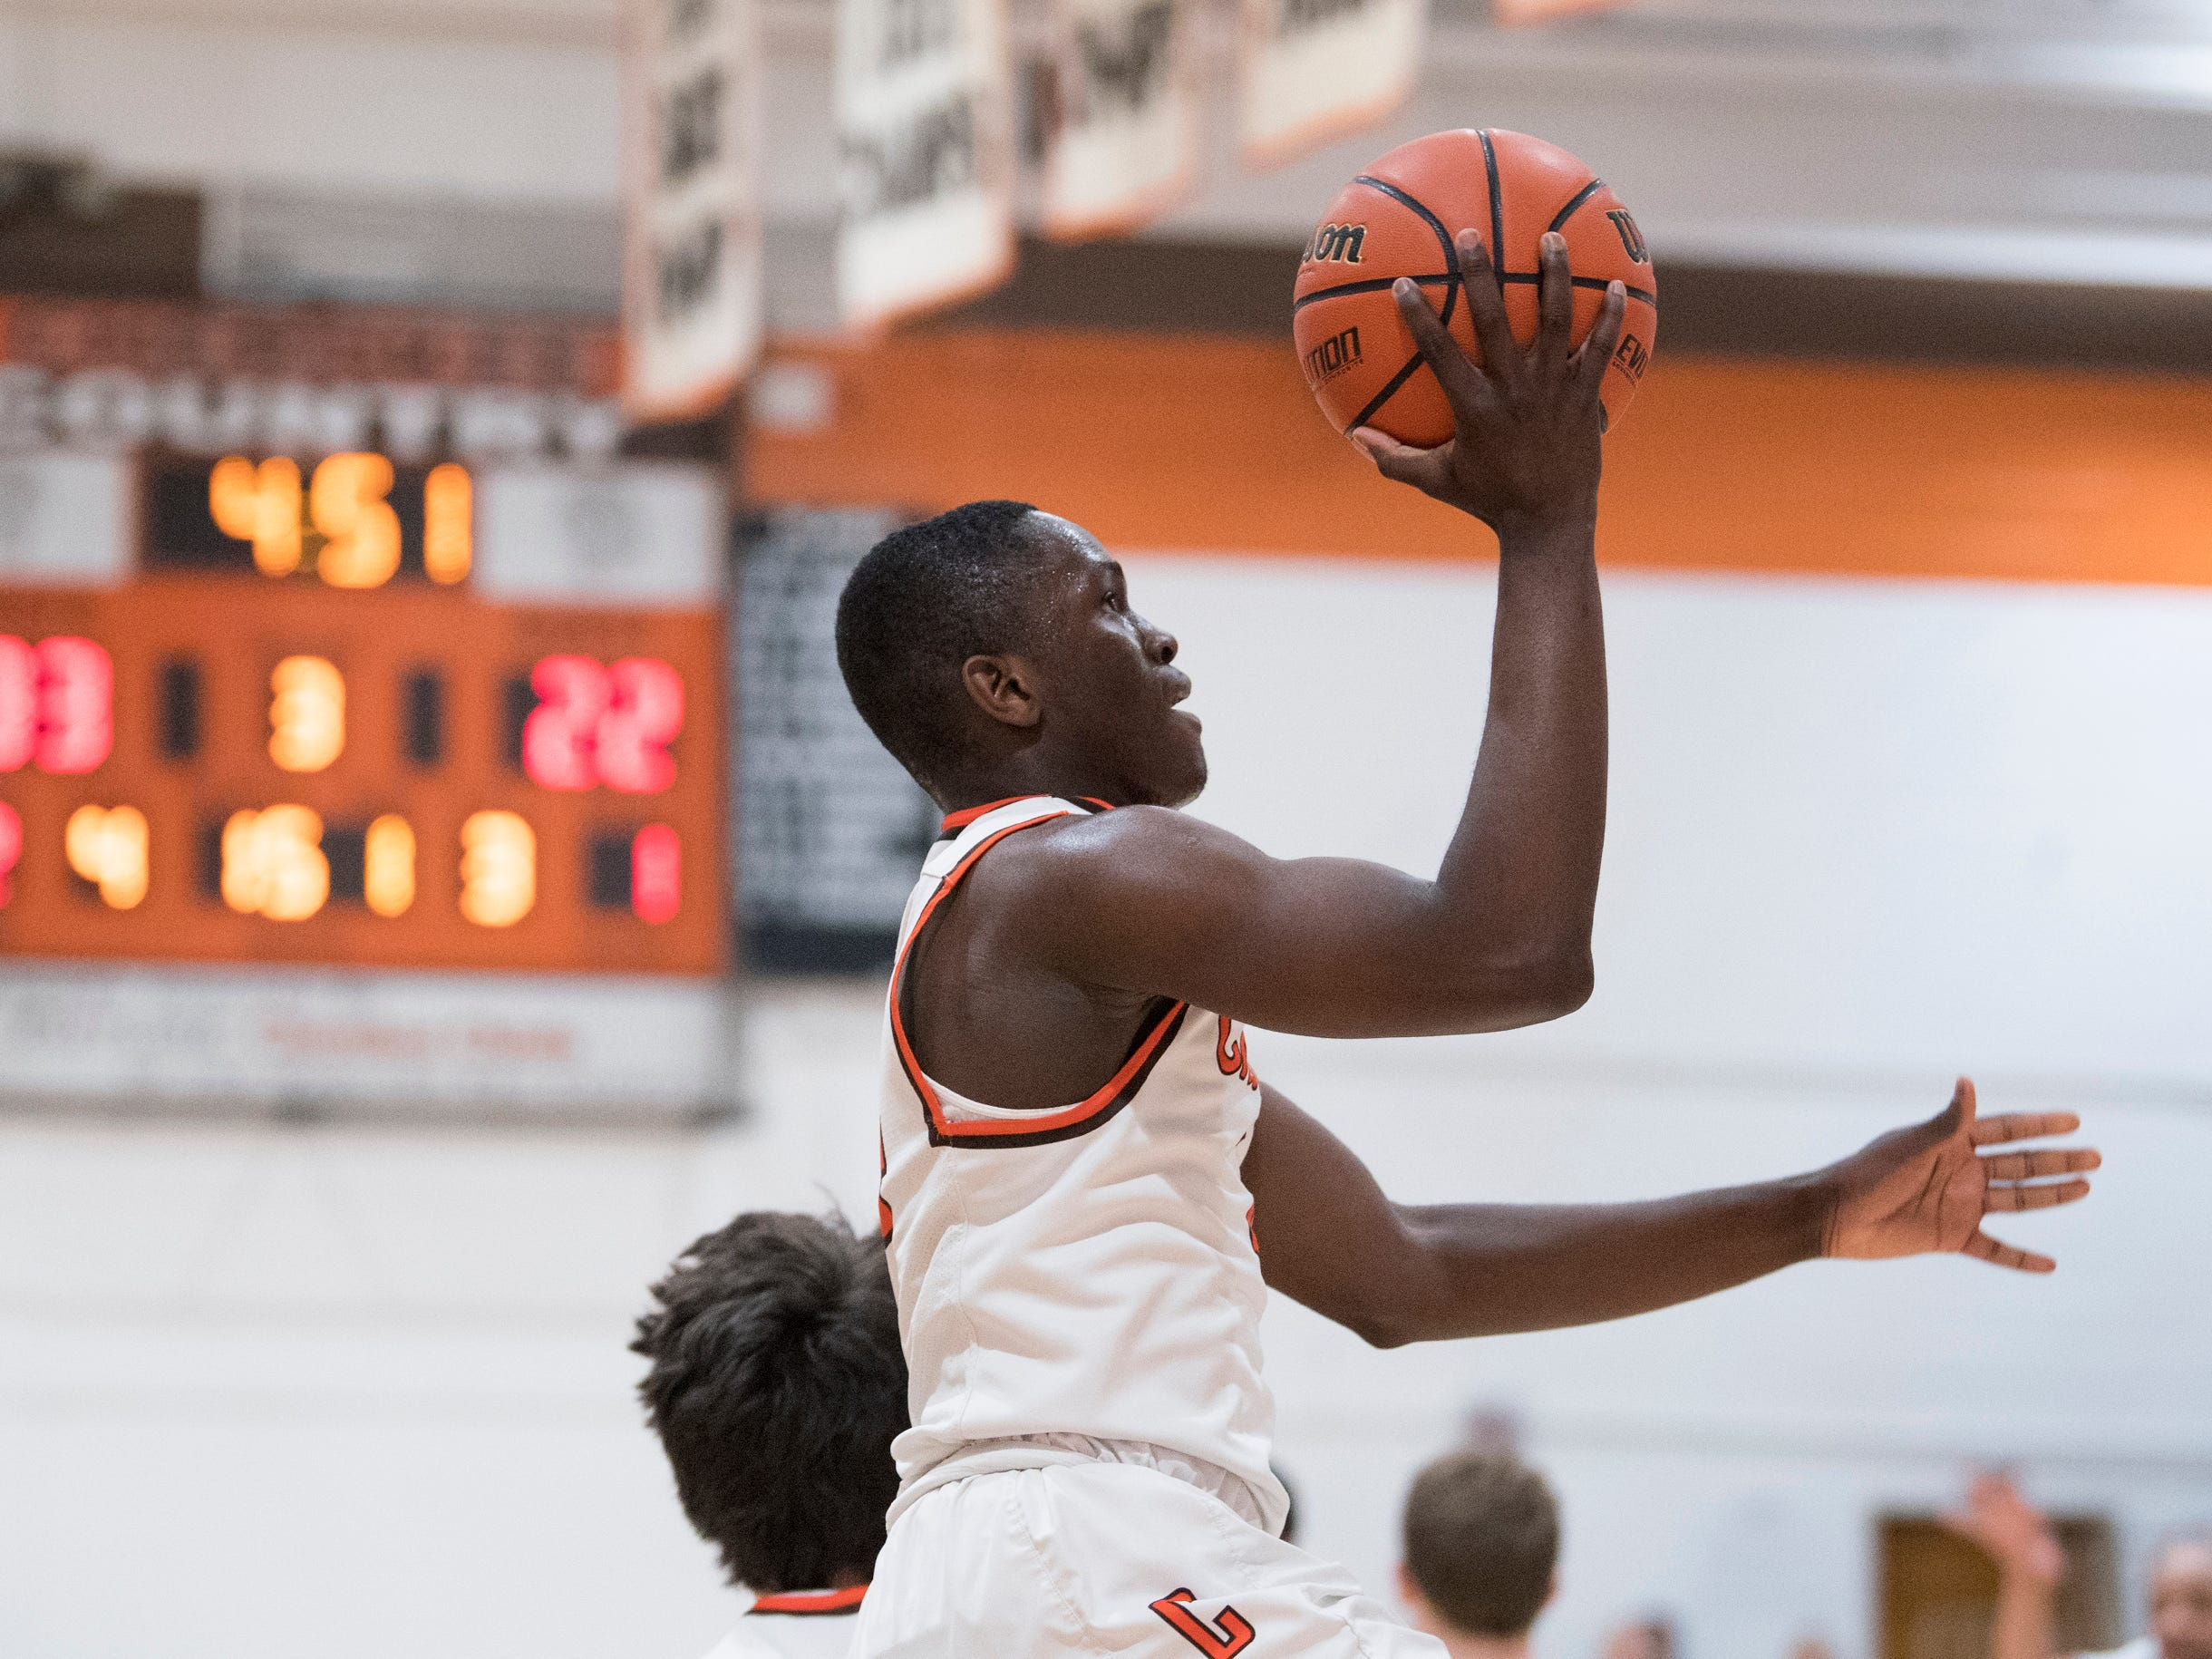 Cherokee's Olare Oladipo (4) drives to the basket against Shawnee Monday, Feb. 25, 2019 at Cherokee High School in Marlton, N.J. Cherokee won 54-38.